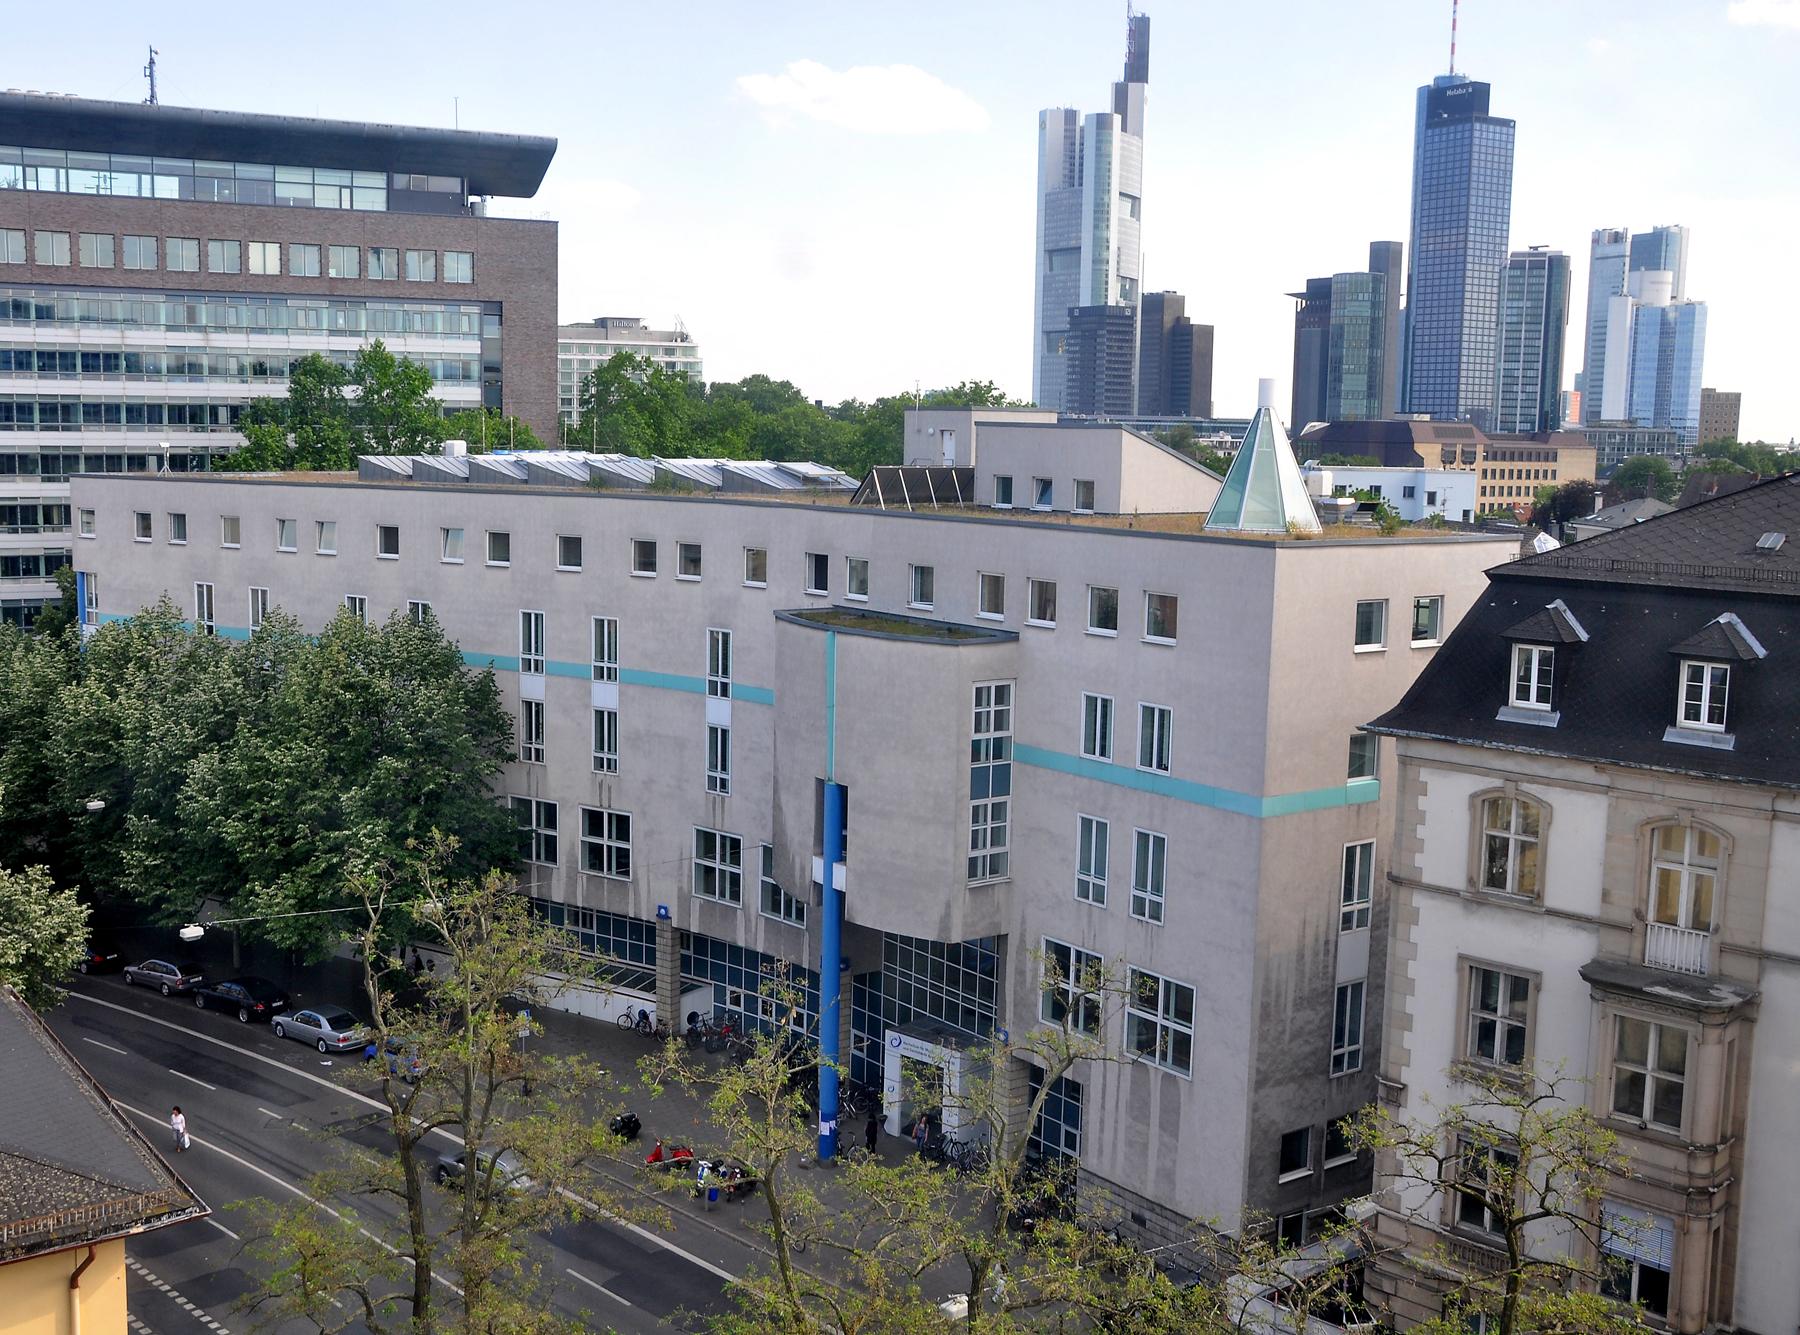 Hfmdk-Frankfurt